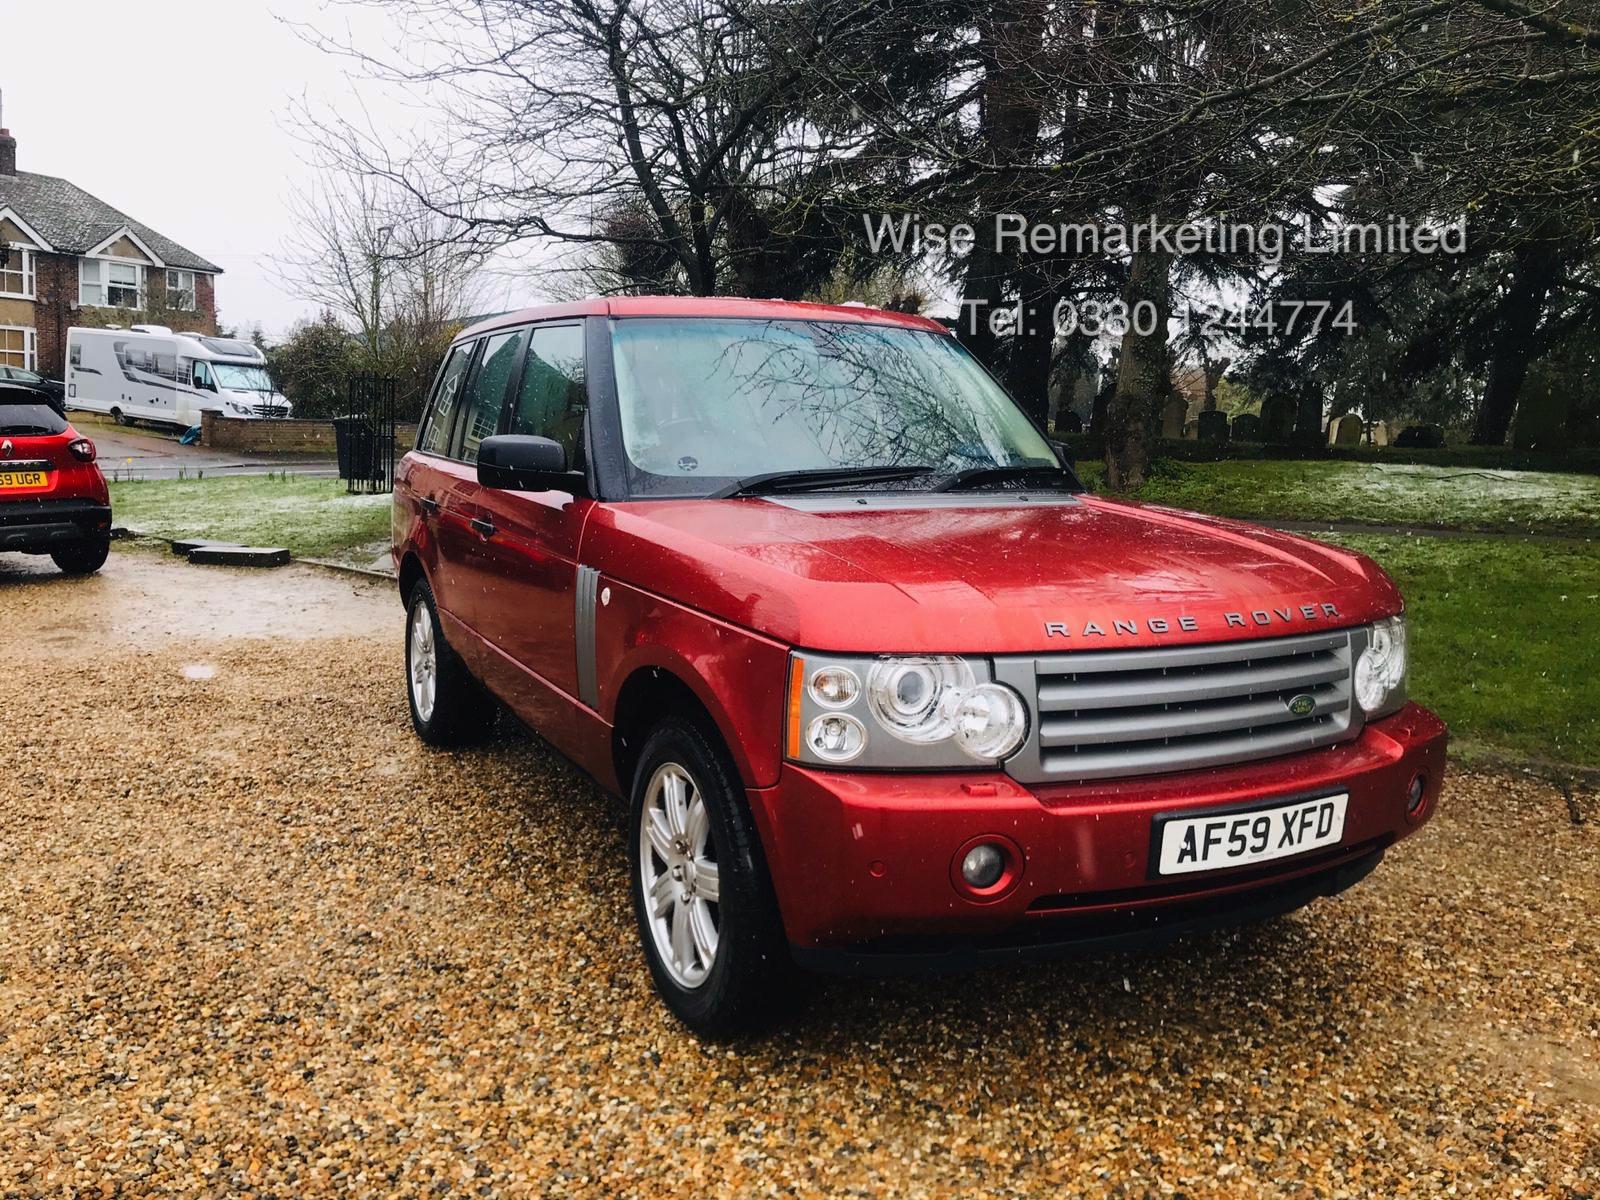 Range Rover Vogue 3.6 TDV8 HSE Auto - 2010 Model - Cream Leather - Service History - - Image 2 of 28